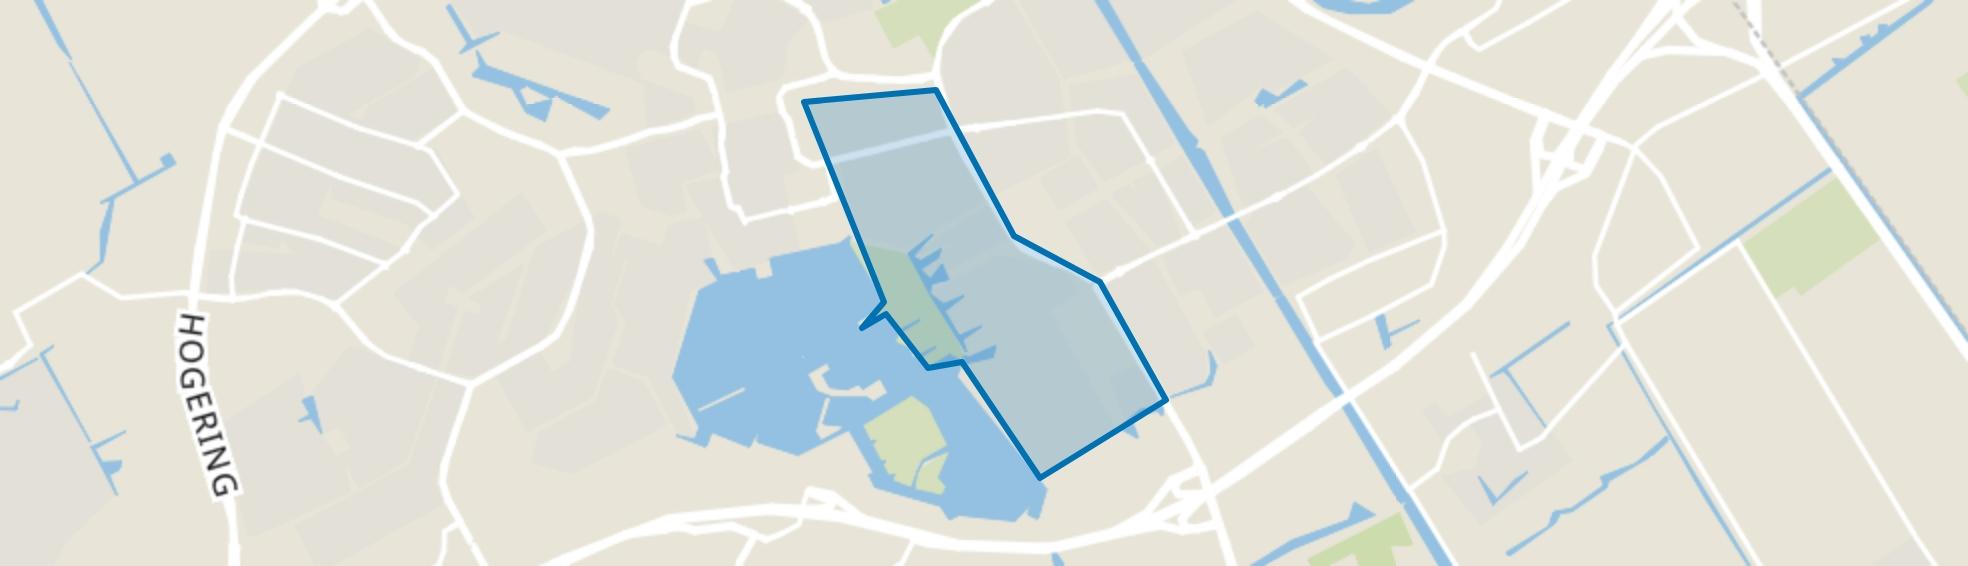 Filmwijk, Almere map